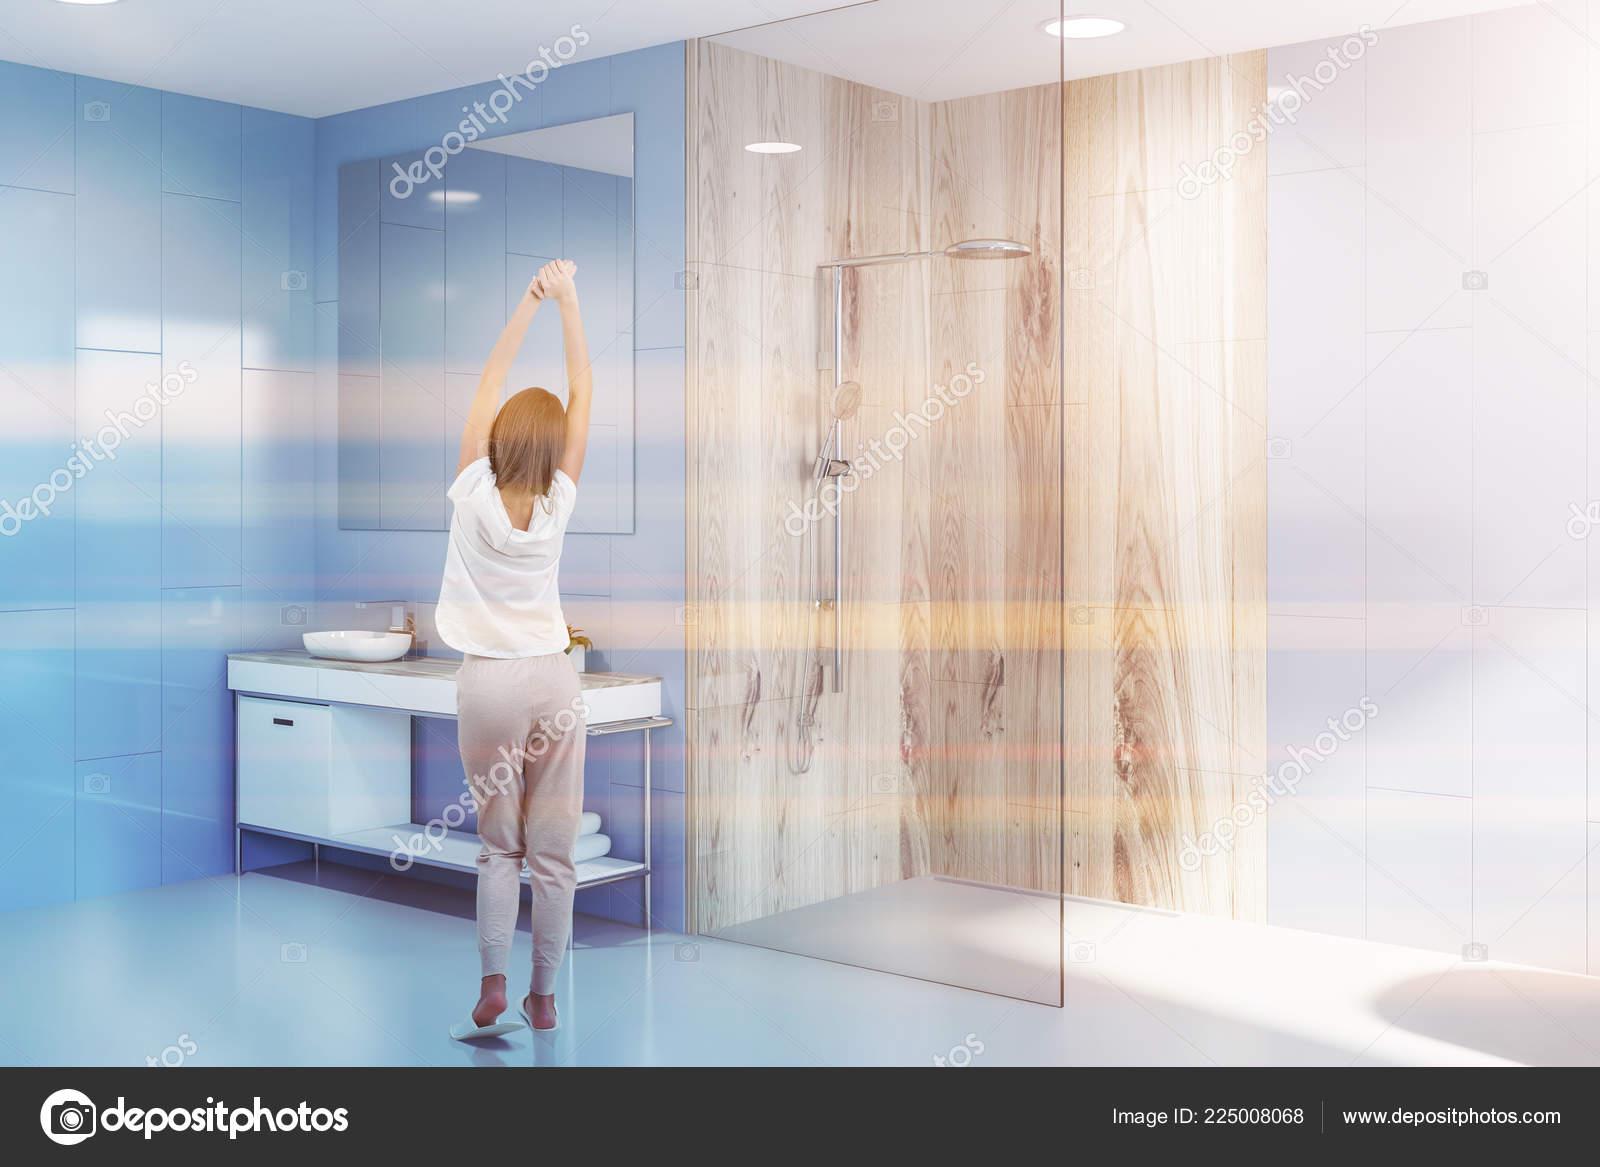 Depositphotos & Woman Modern Bathroom Blue Walls White Floor Glass Wooden ...